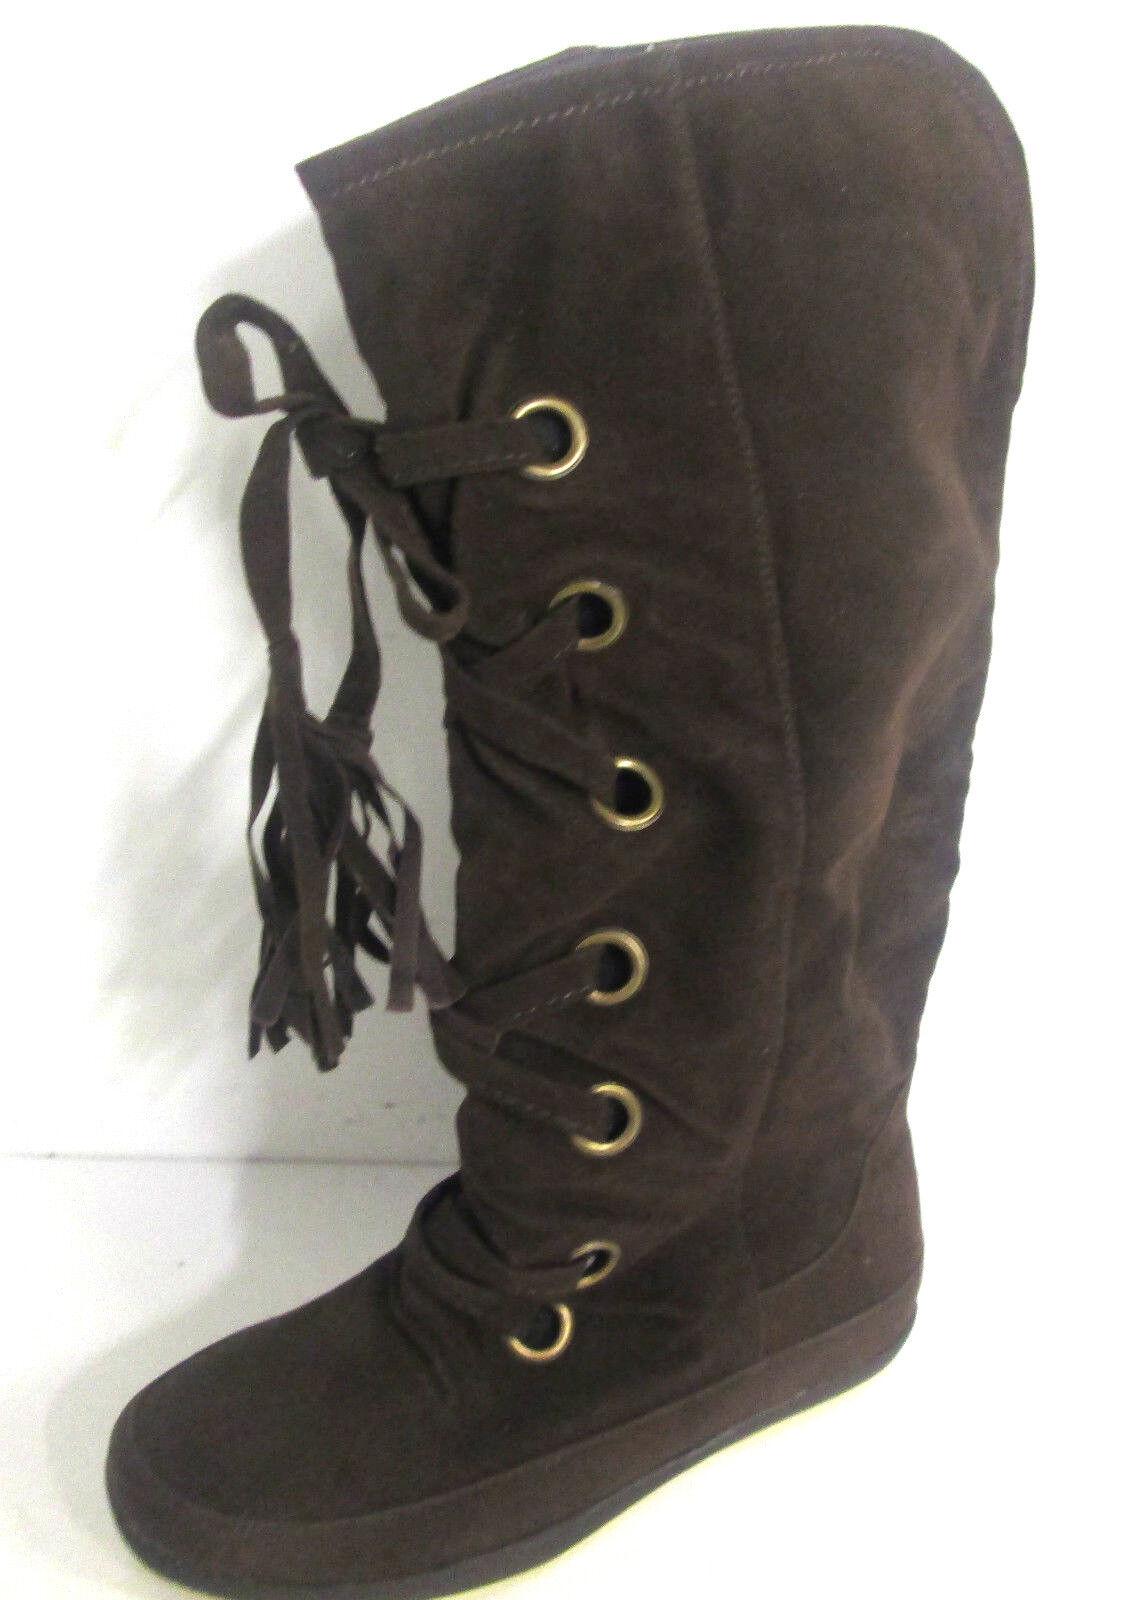 Ladies Spot On Dark Brown Textile Knee High Boots with Tassels - F4294